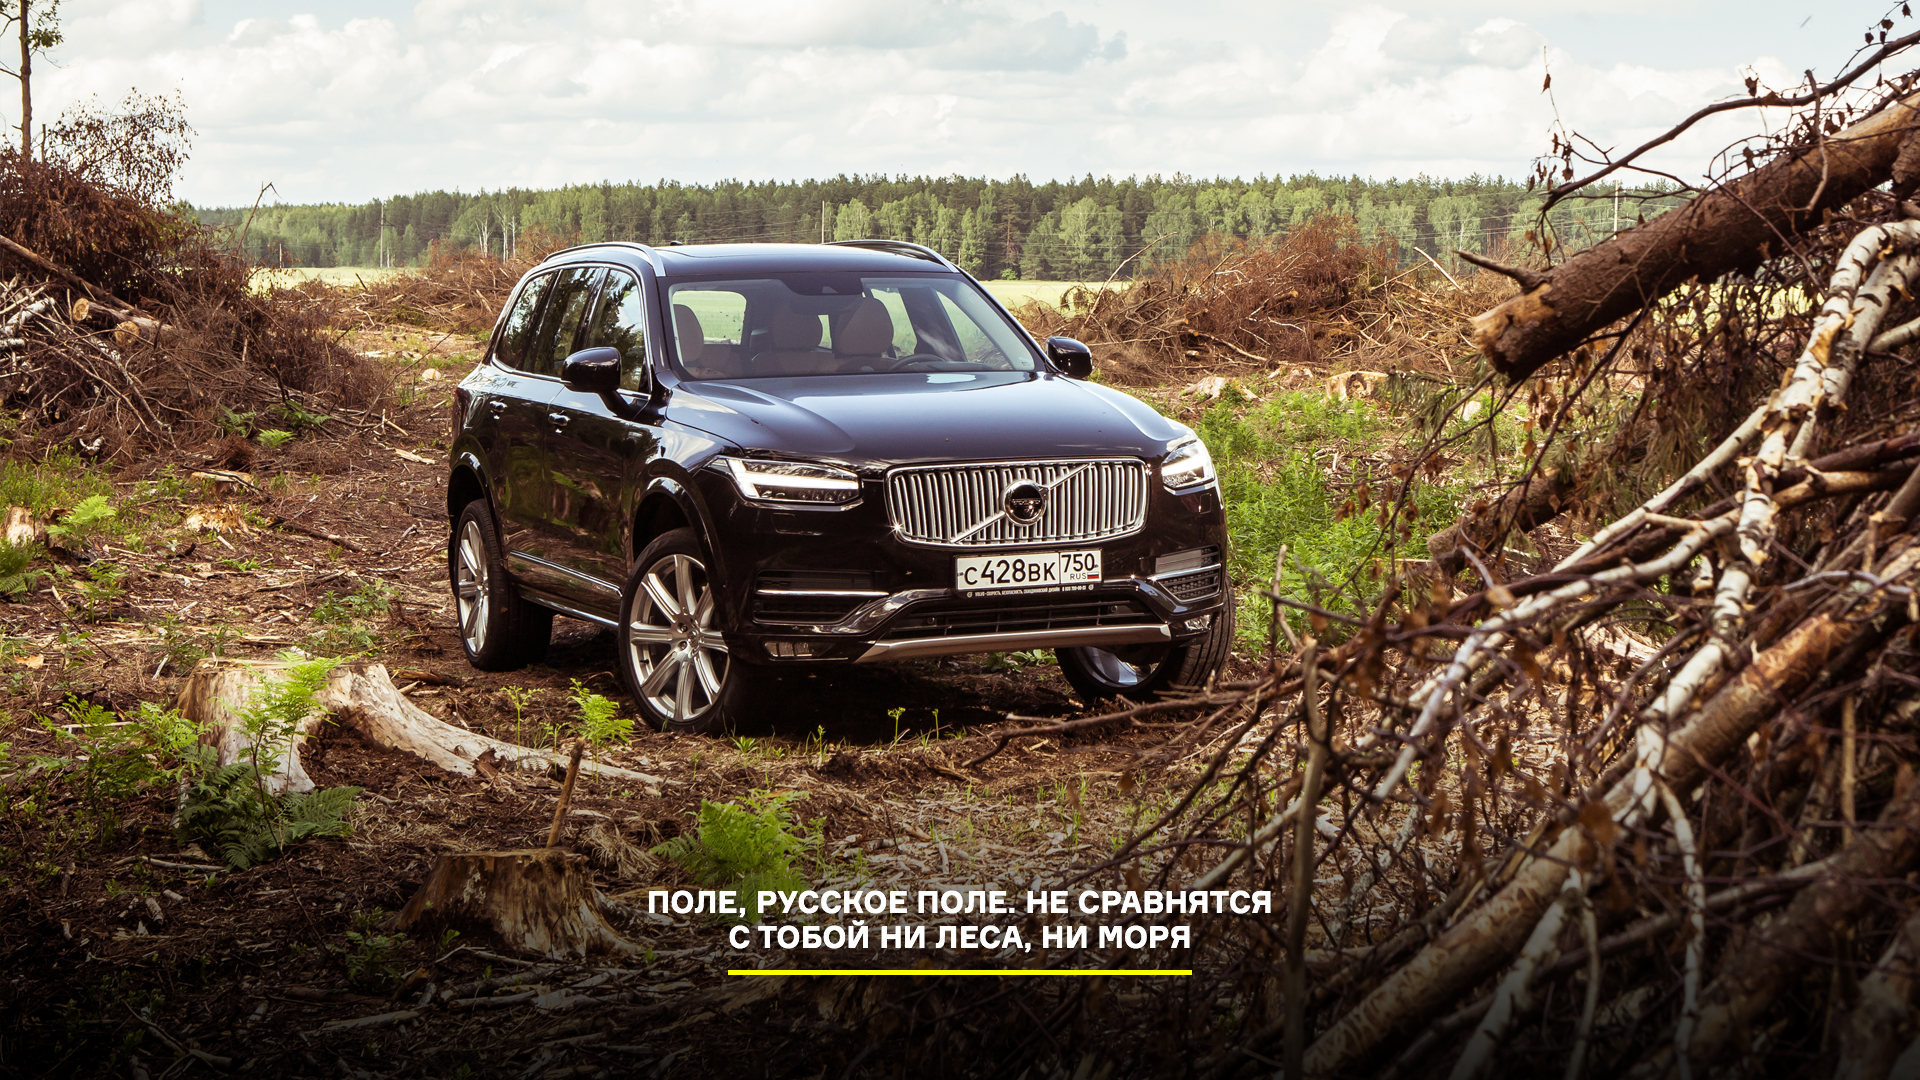 21-дюймовые колеса вроссийских ямах иматрешка вместо рычага «автомата»: тест Volvo XC90. Фото 16